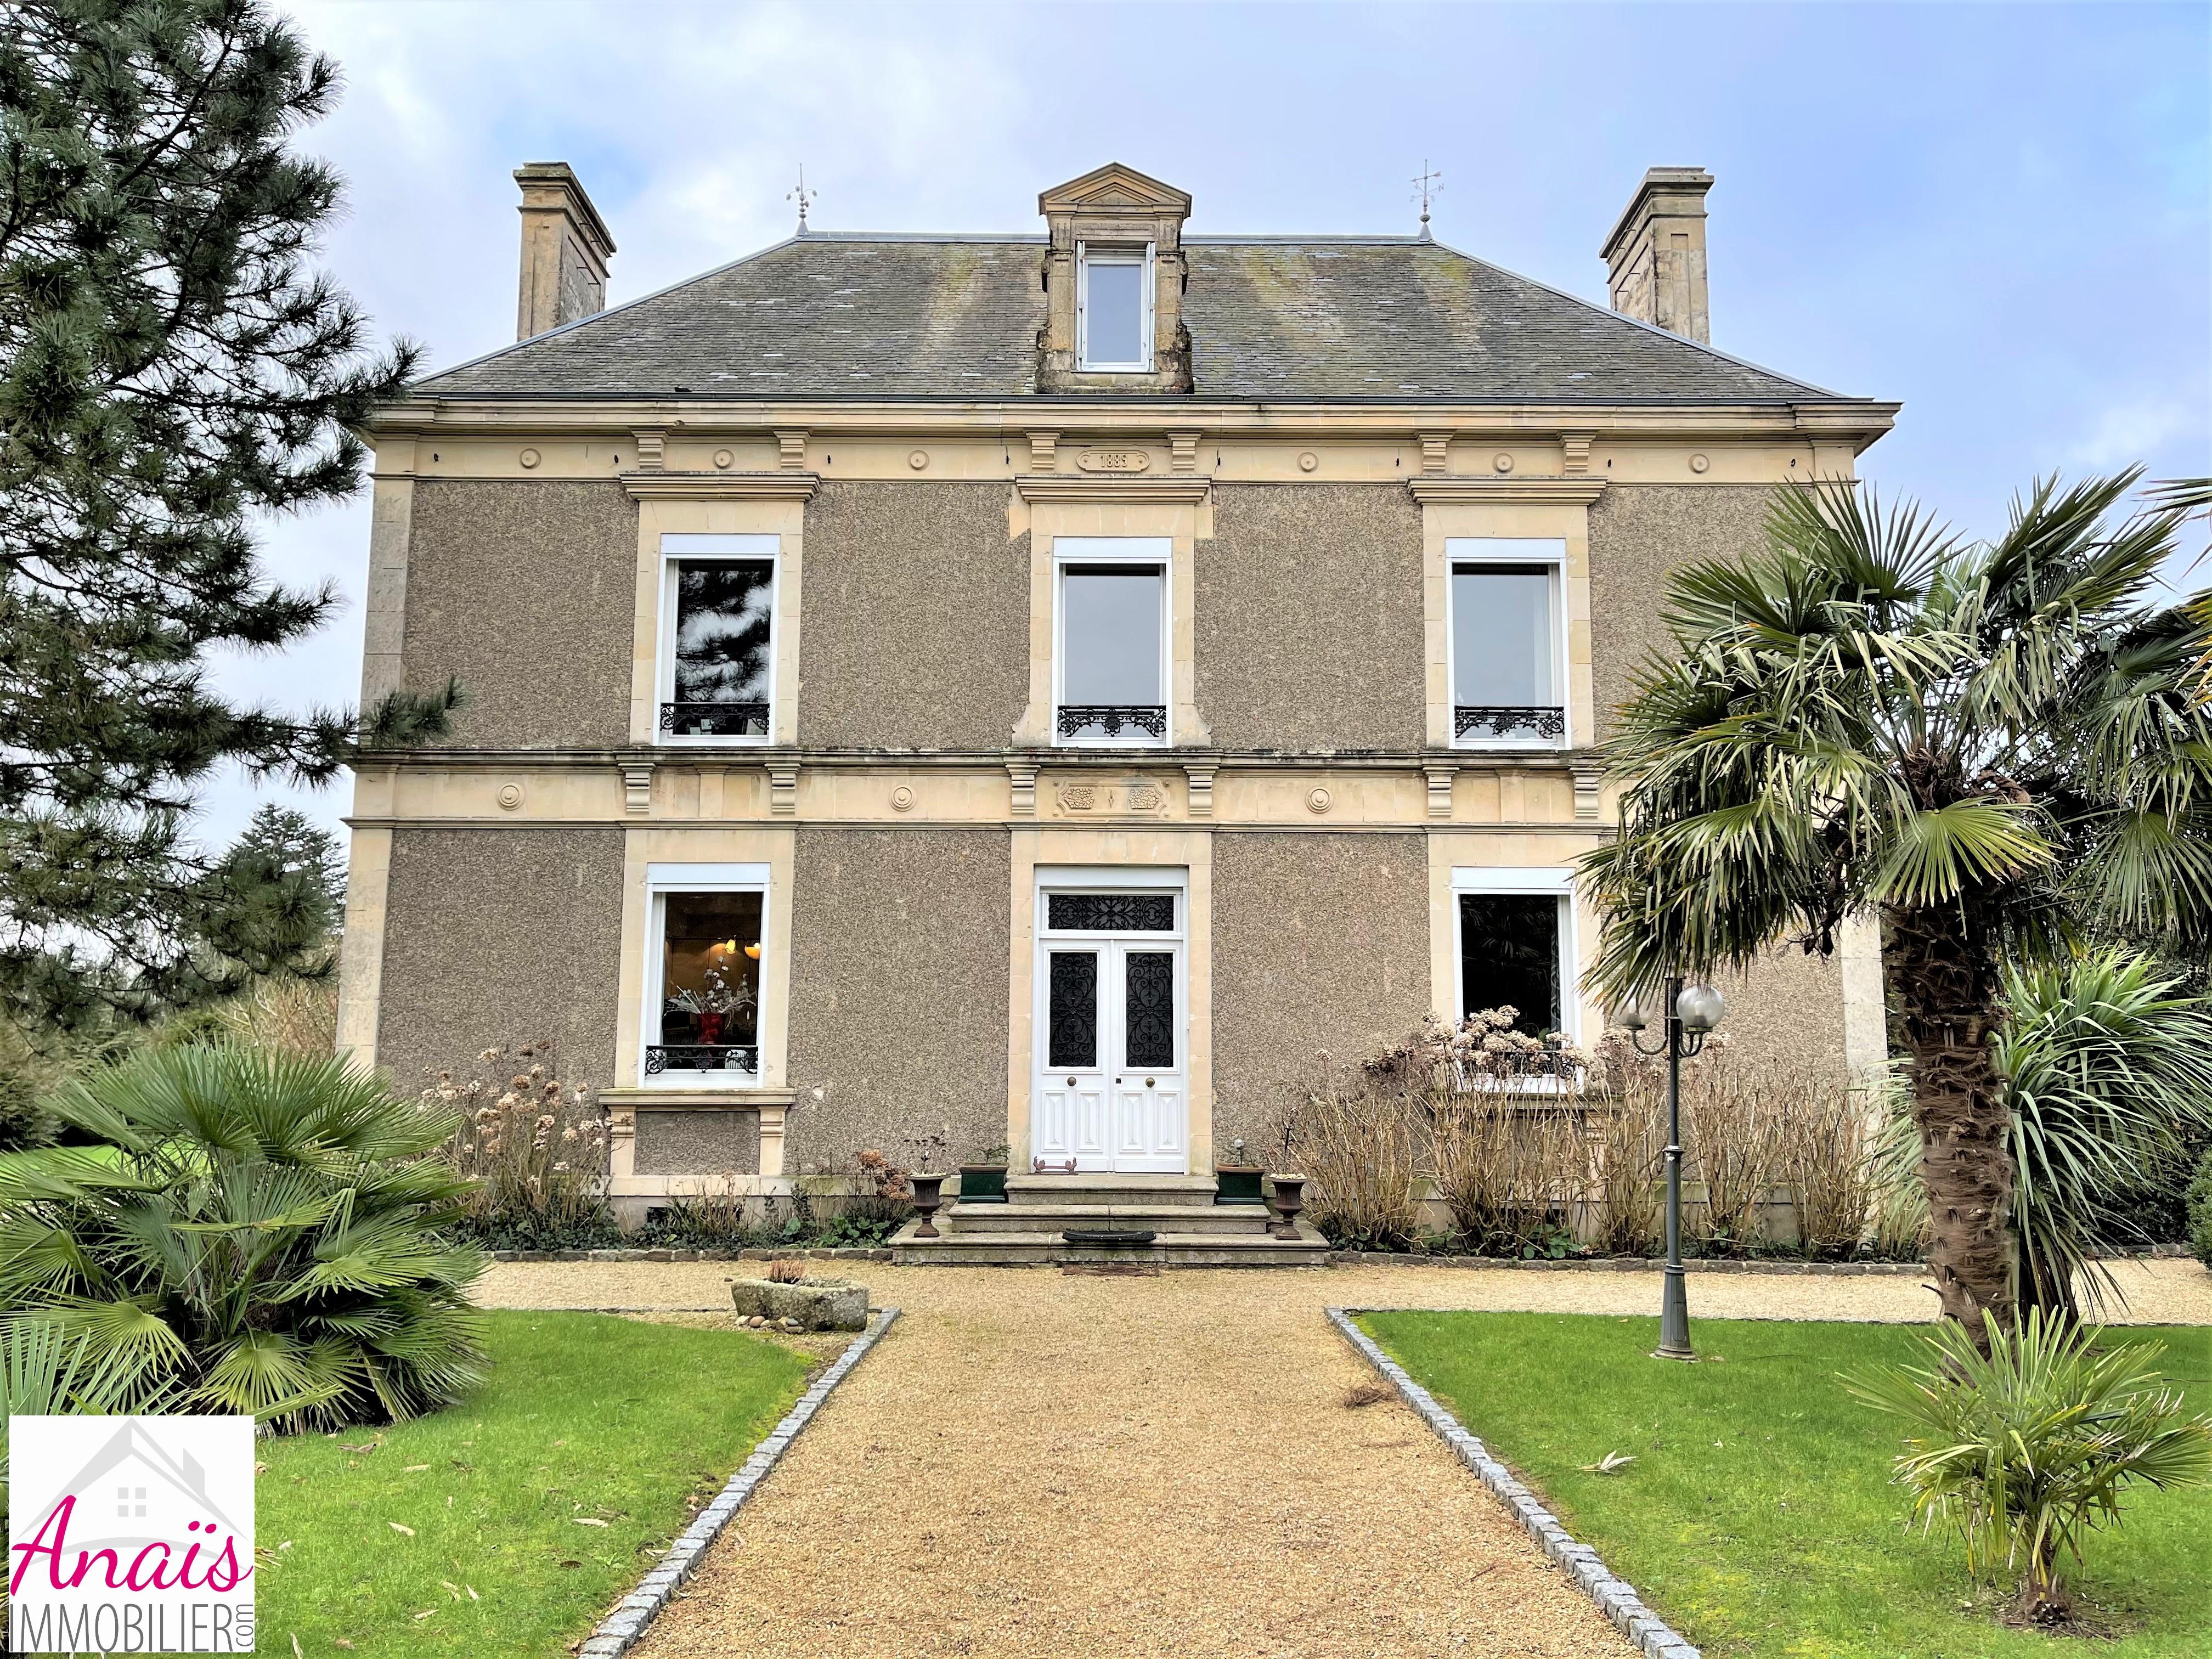 St Pellerin : 366 800 €